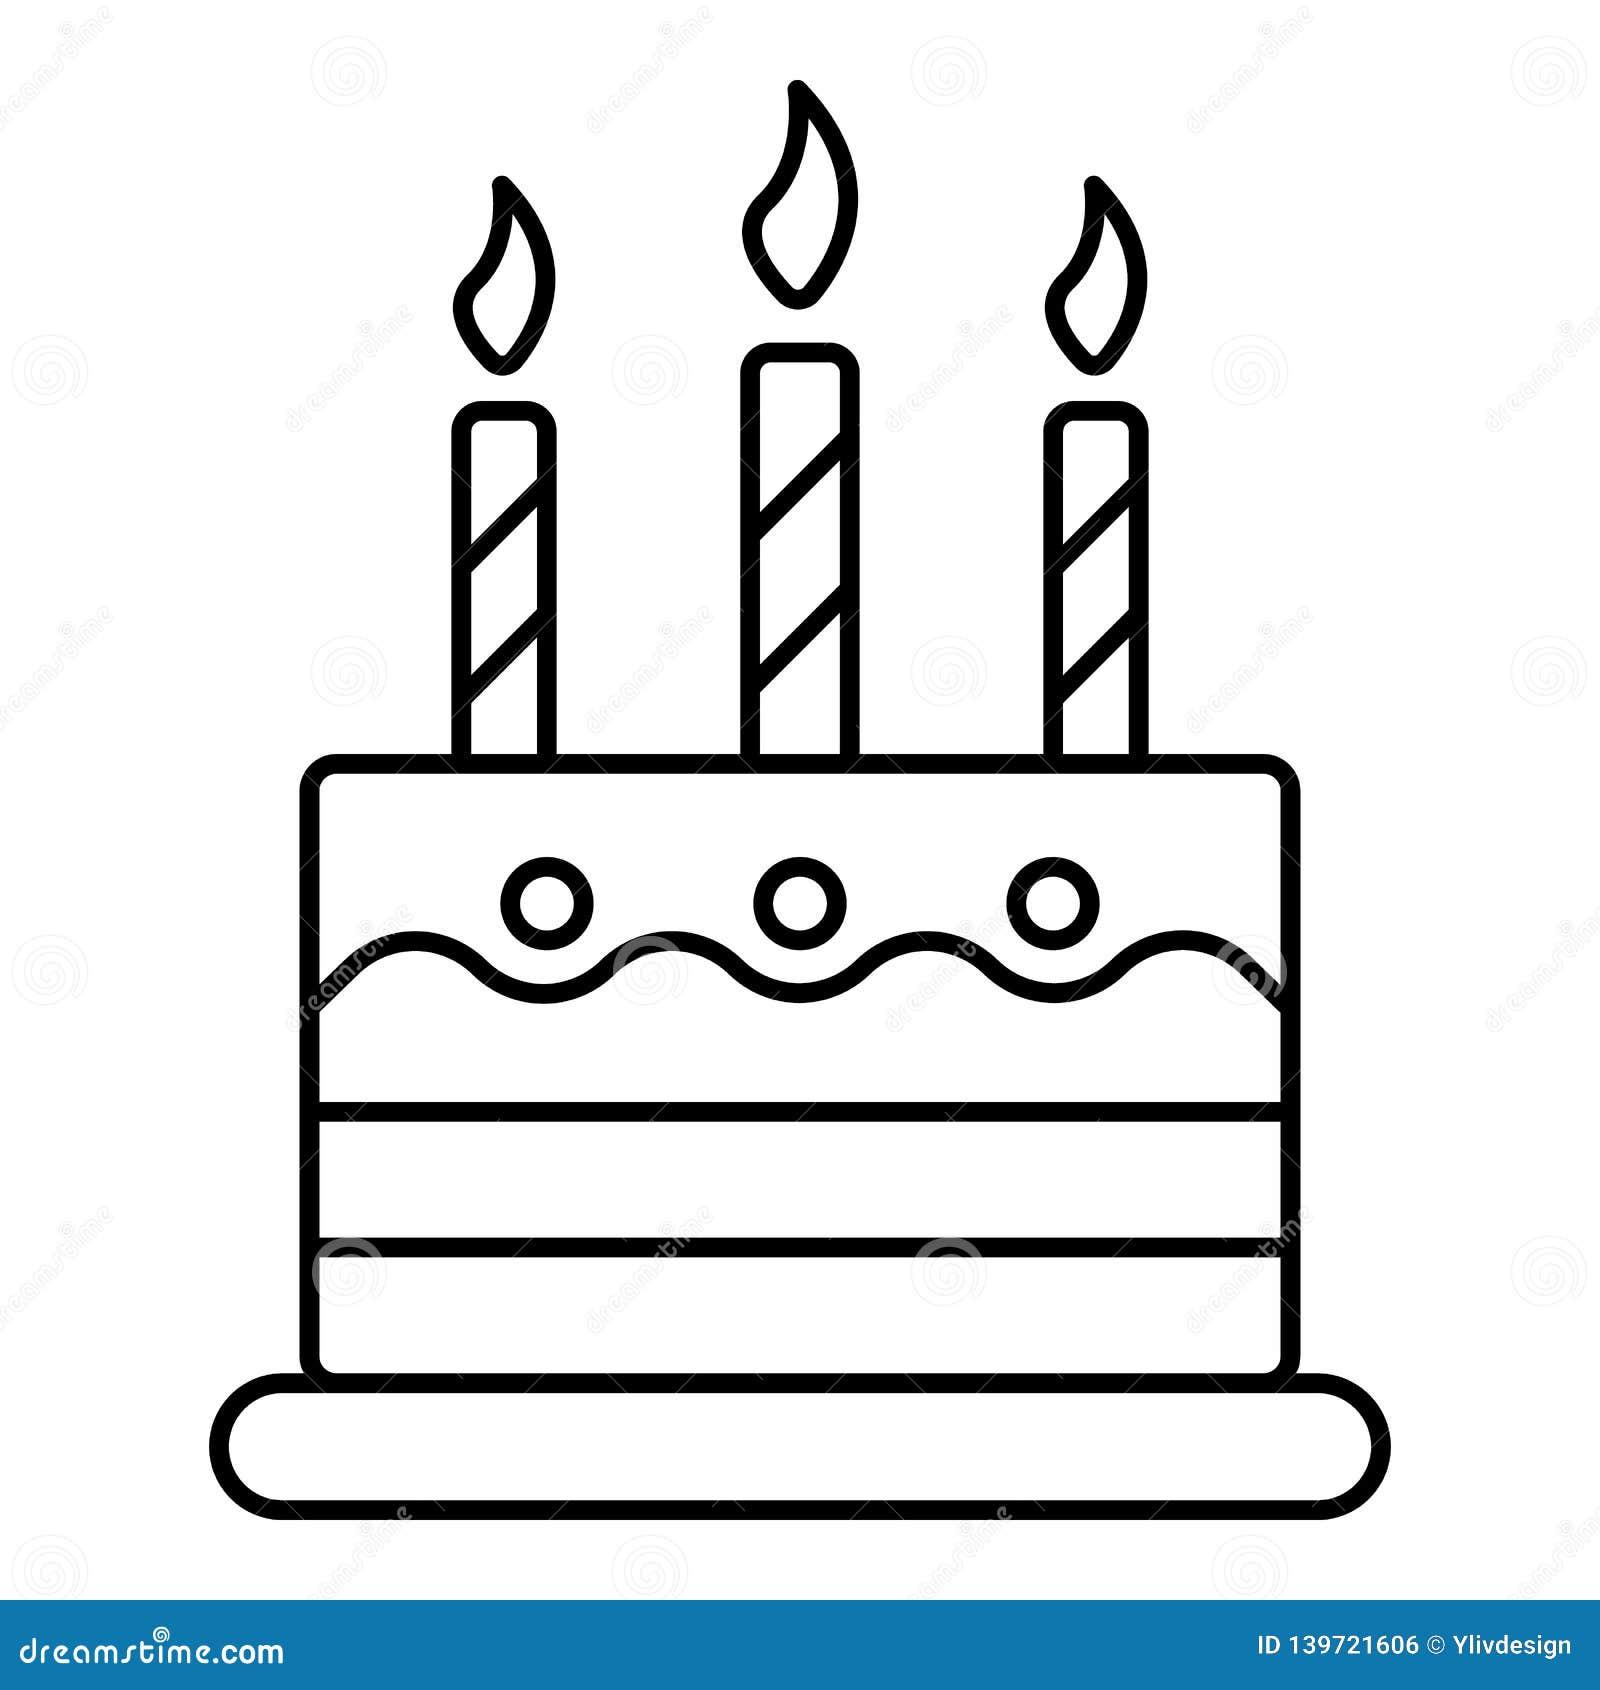 Tremendous Kid Birthday Cake Icon Outline Style Stock Vector Illustration Funny Birthday Cards Online Kookostrdamsfinfo